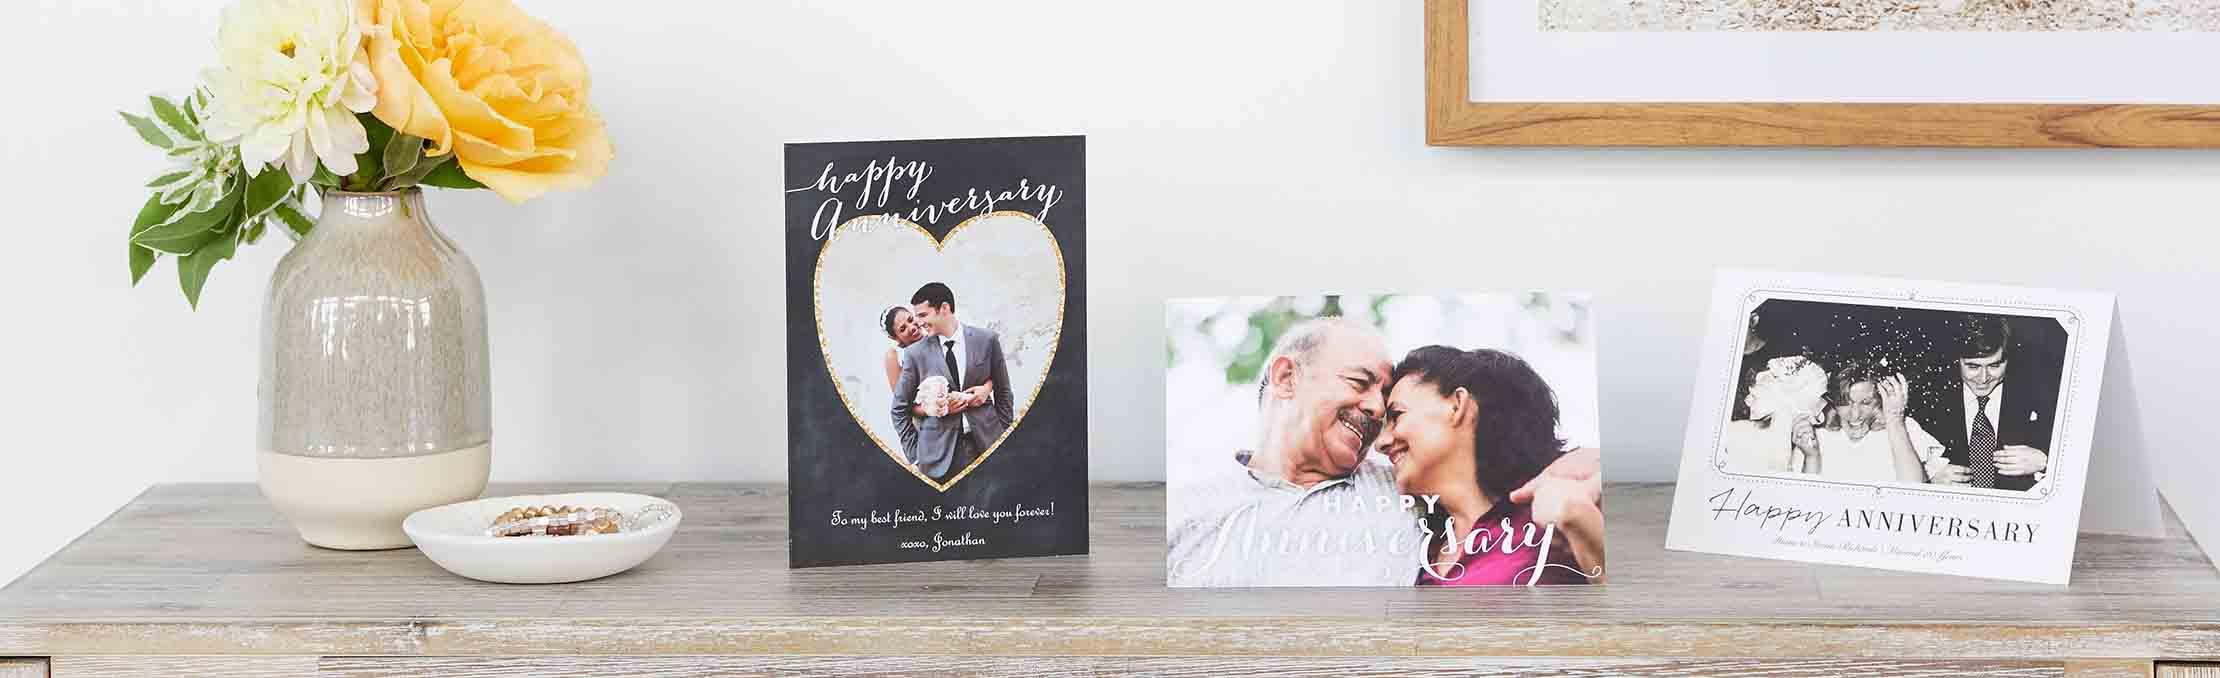 Last Minute Wedding Anniversary Card Ideas Walgreens Photo Blog